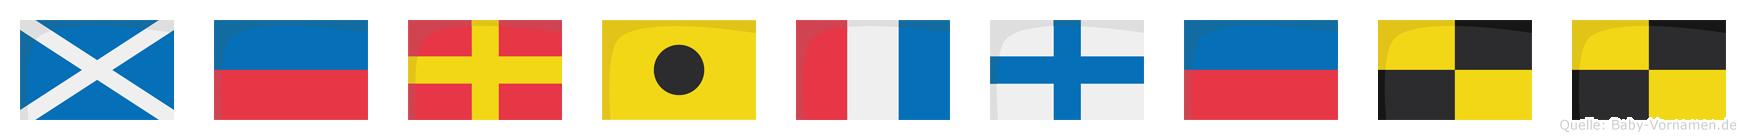 Meritxell im Flaggenalphabet